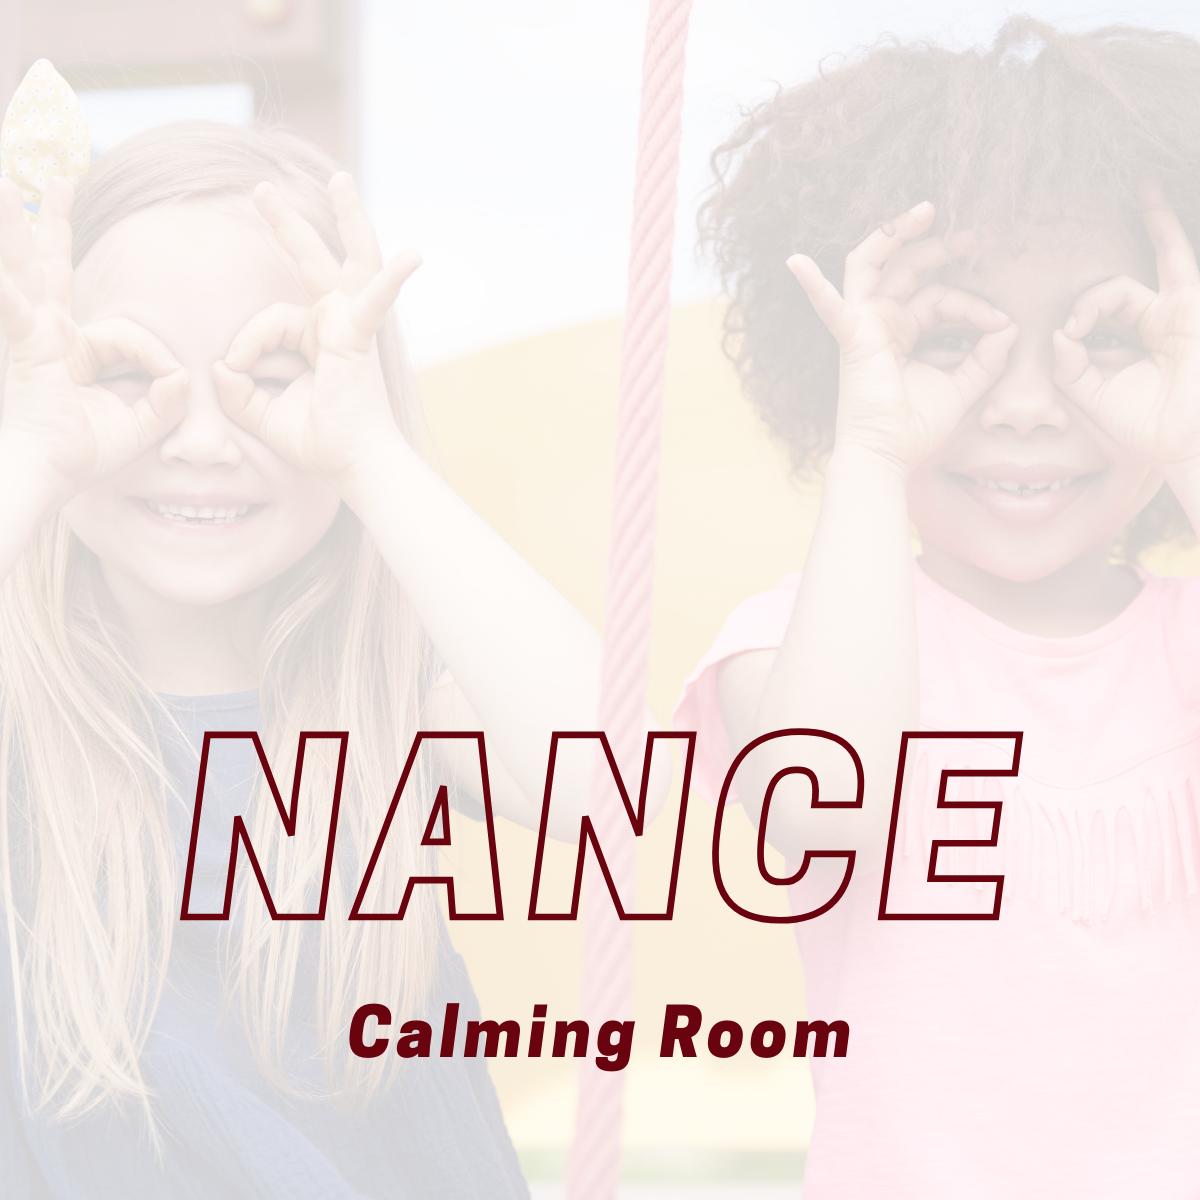 Nance Calming Room